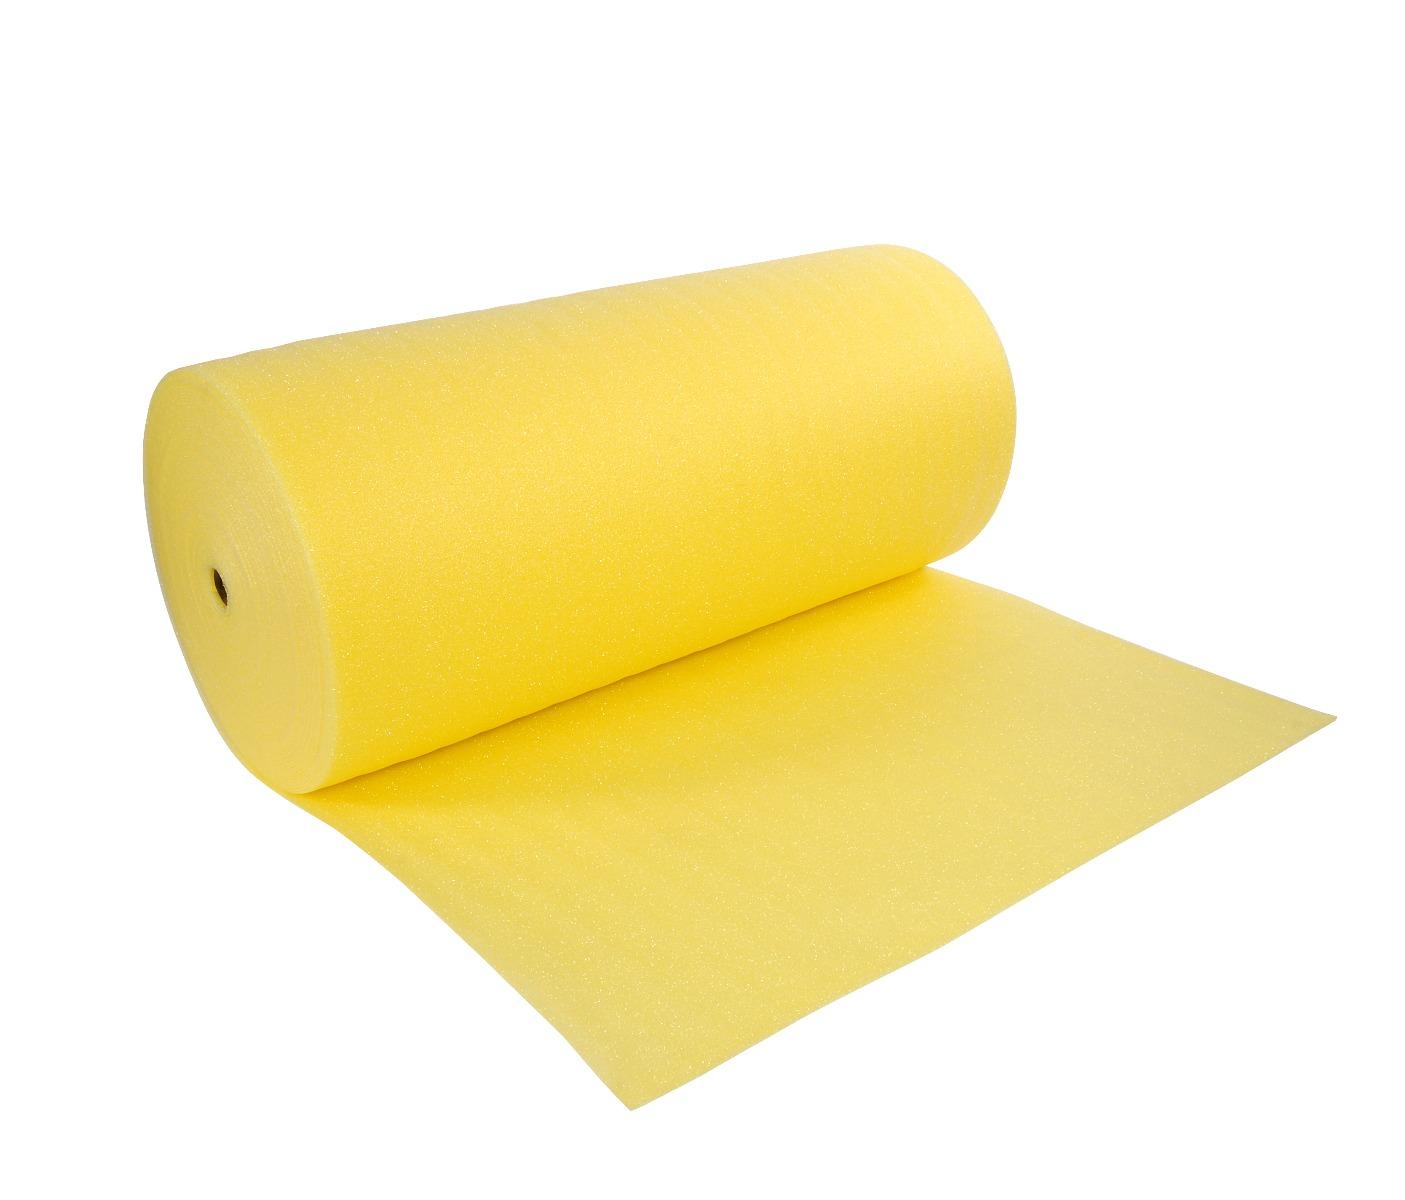 Acoustic Floor Insulation